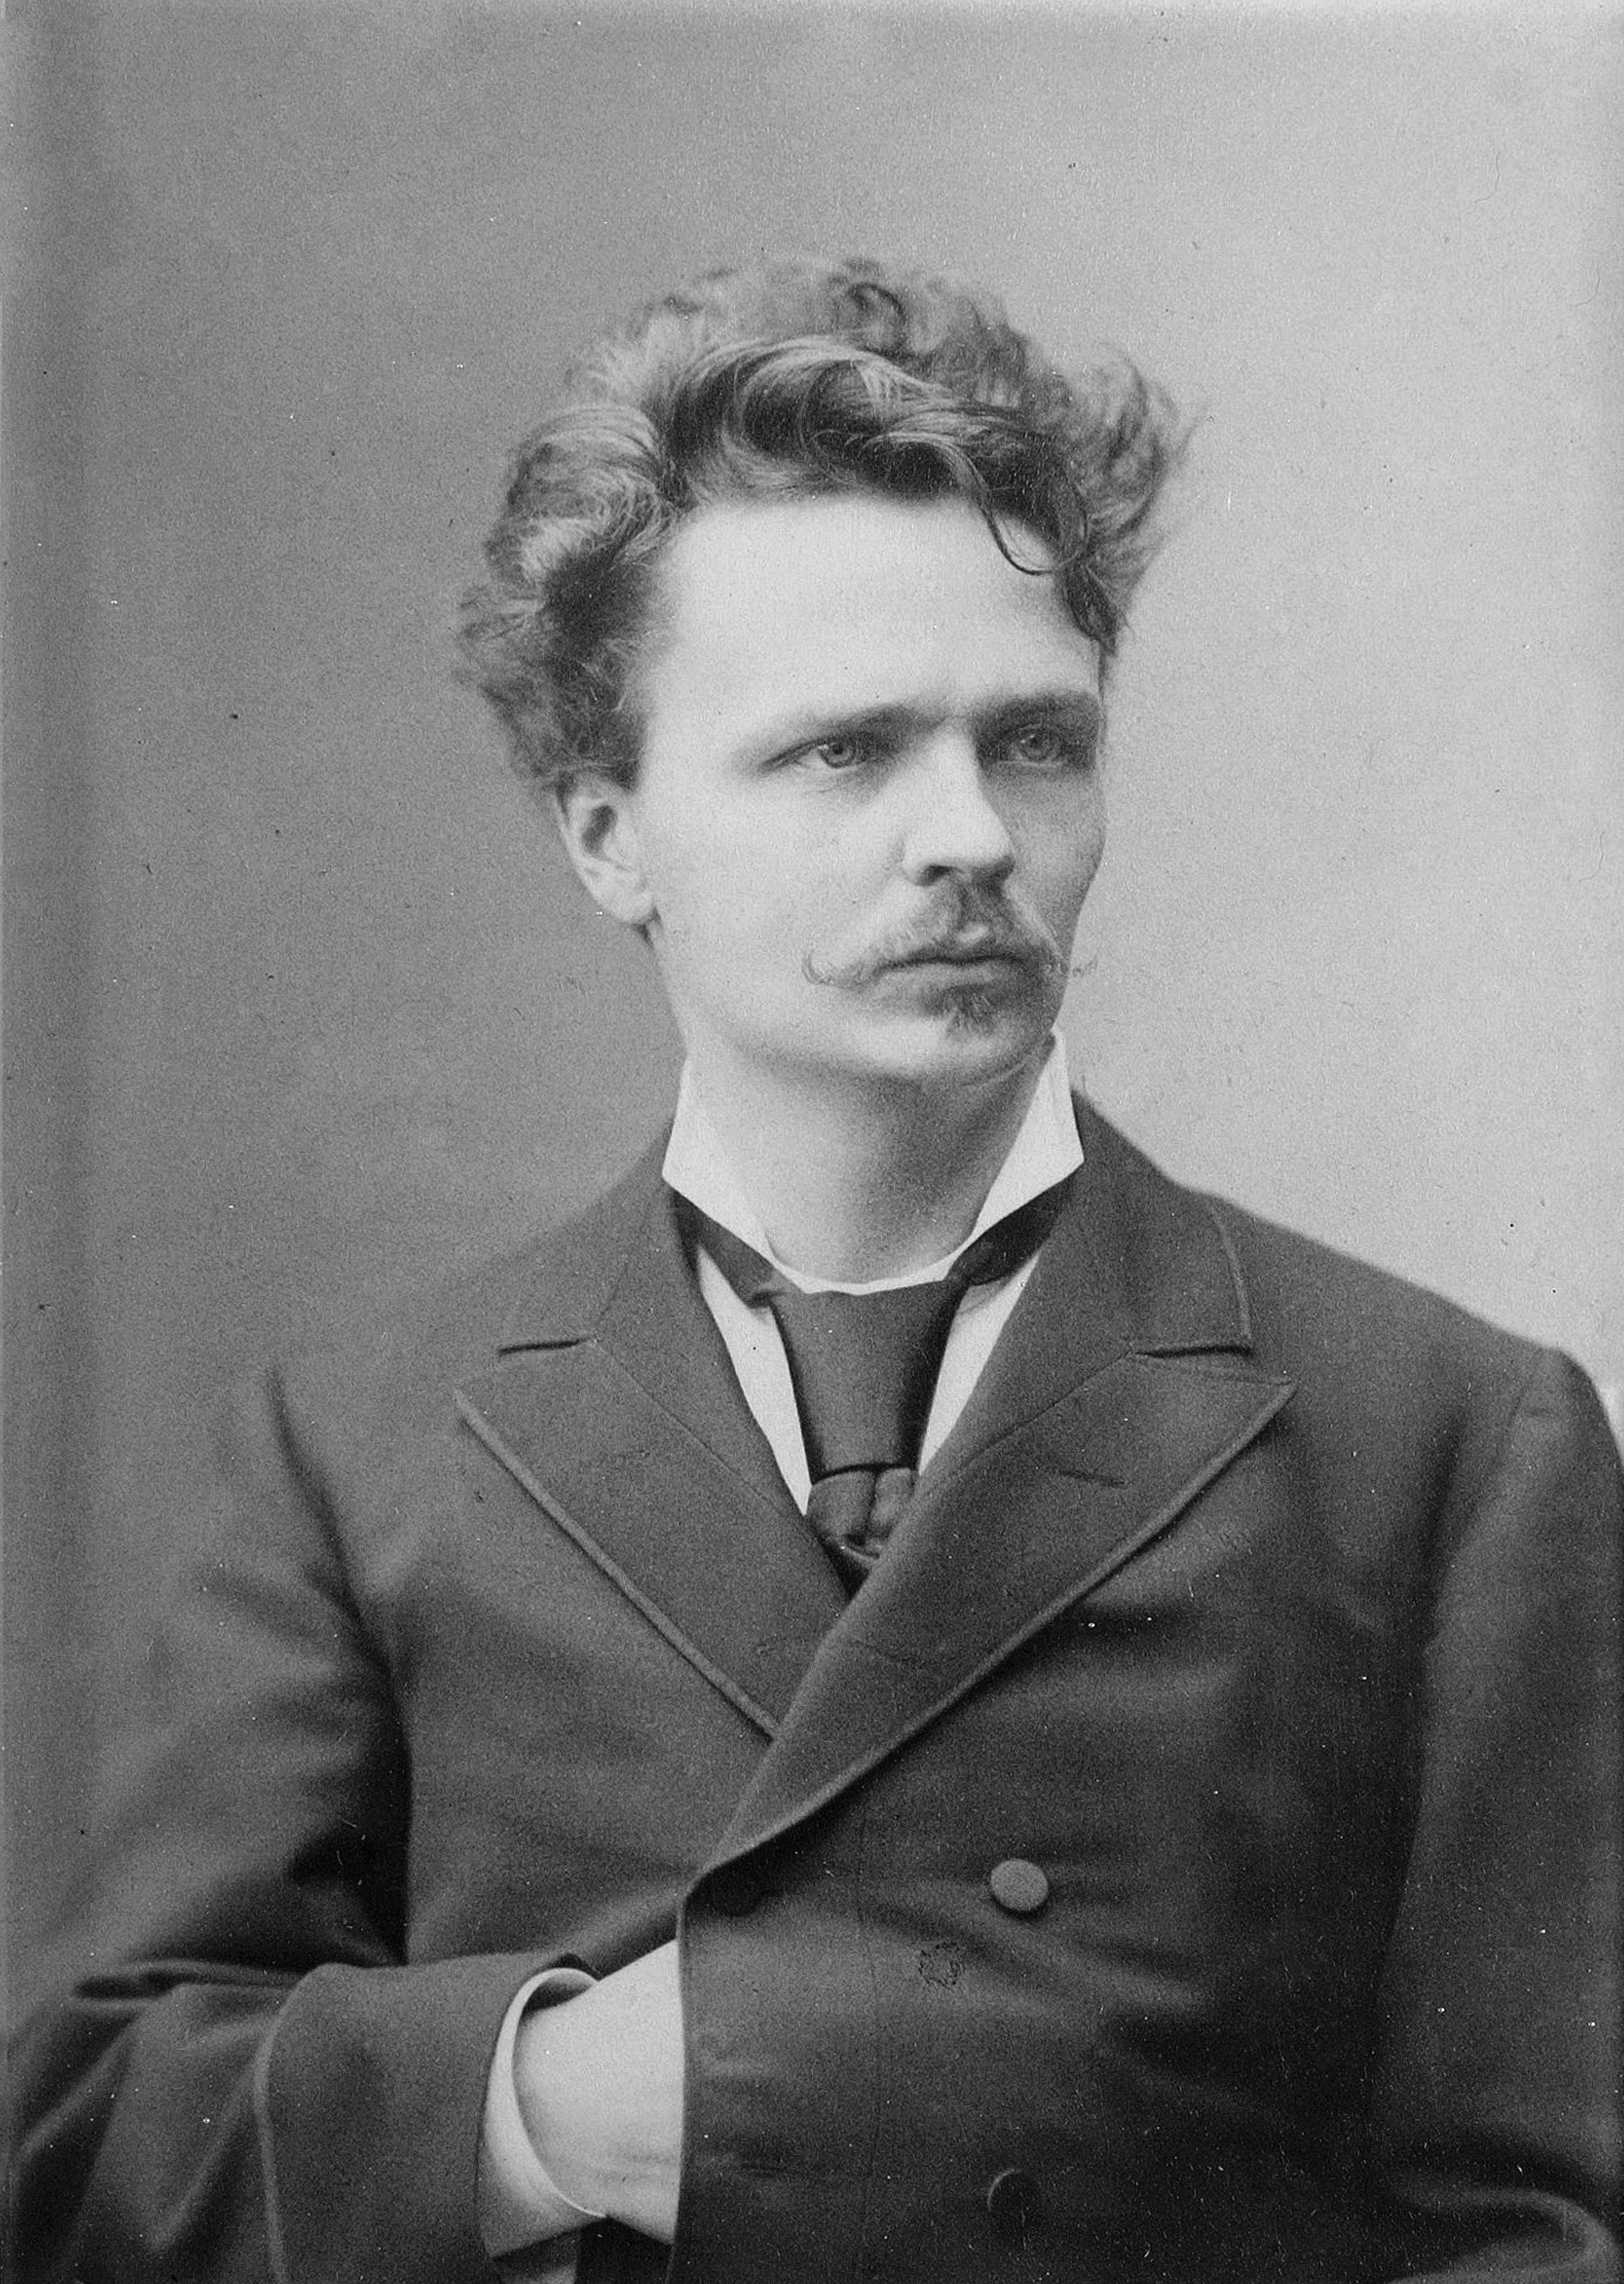 August Strindberg (1849-1912)